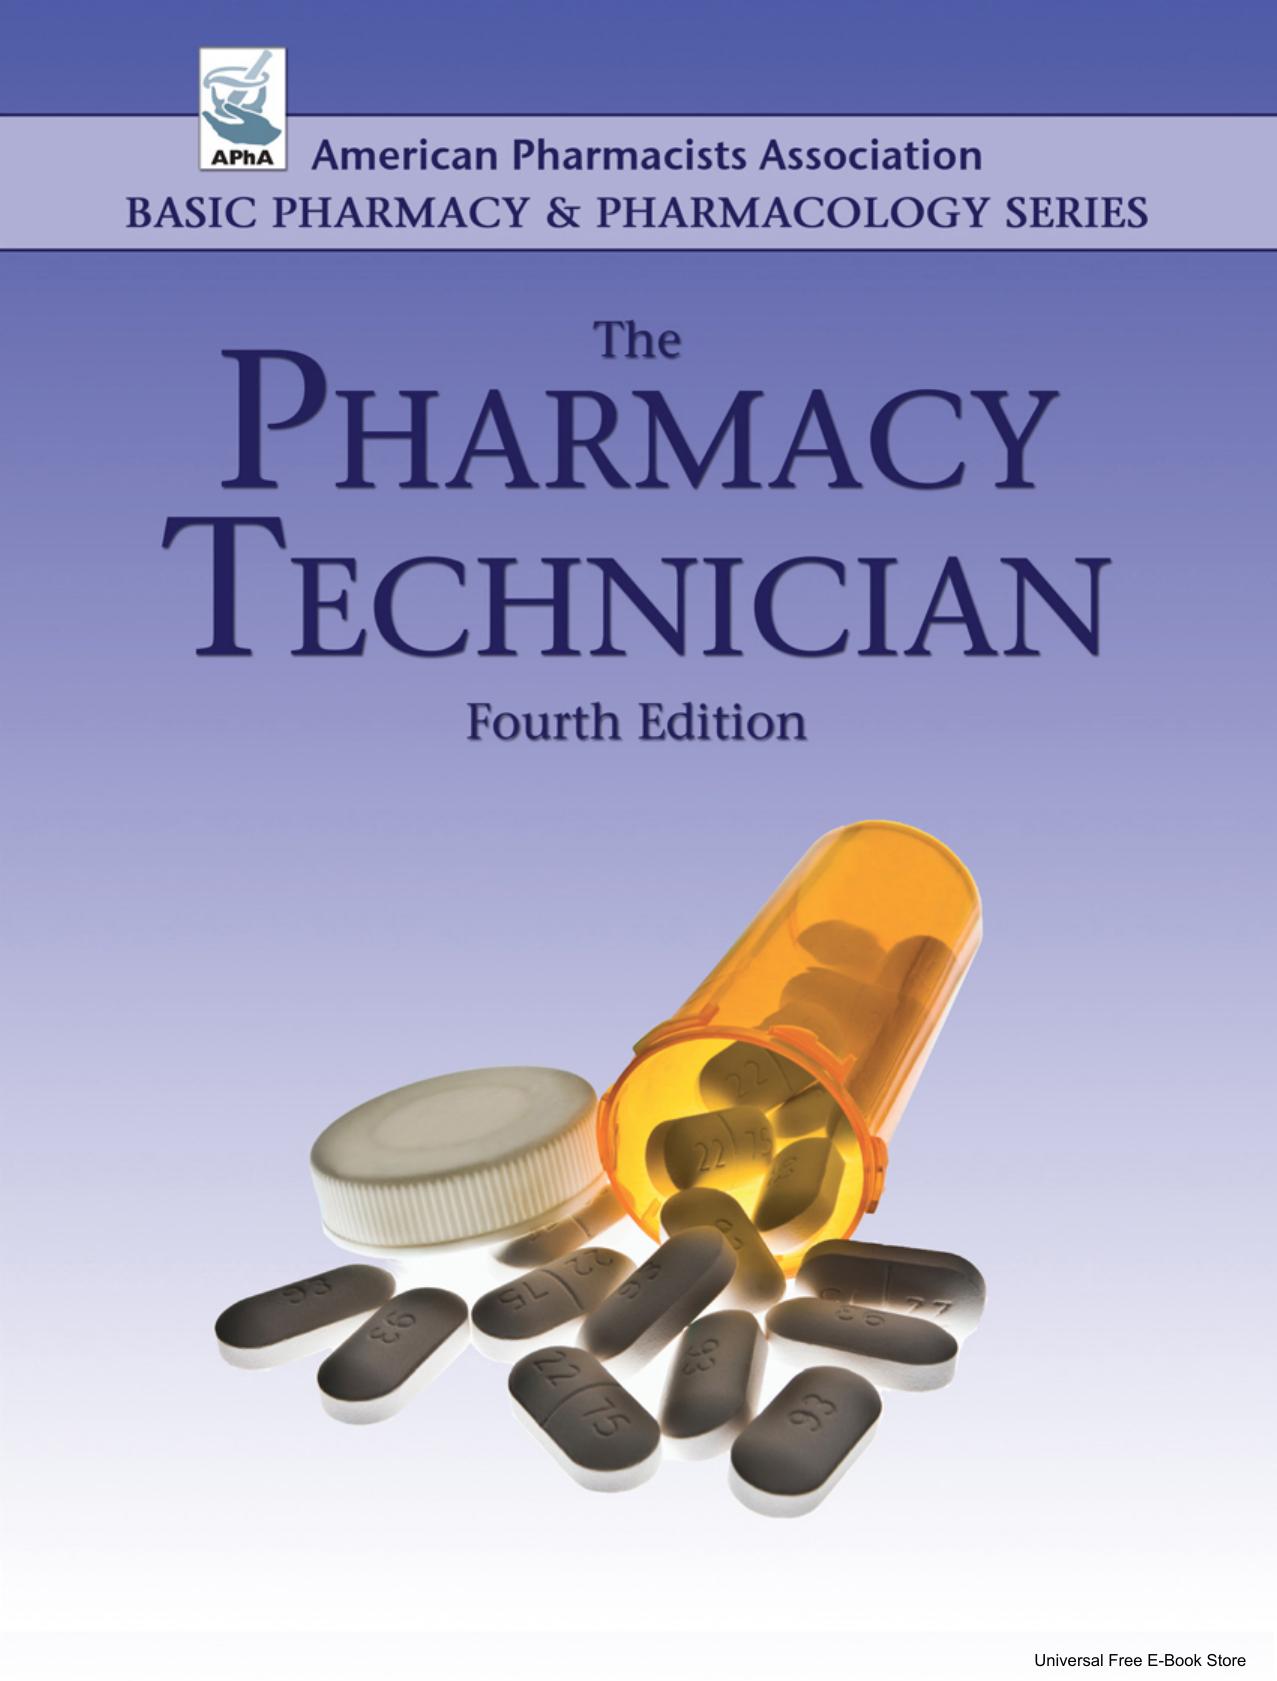 The Pharmacy Technician 4th Edition